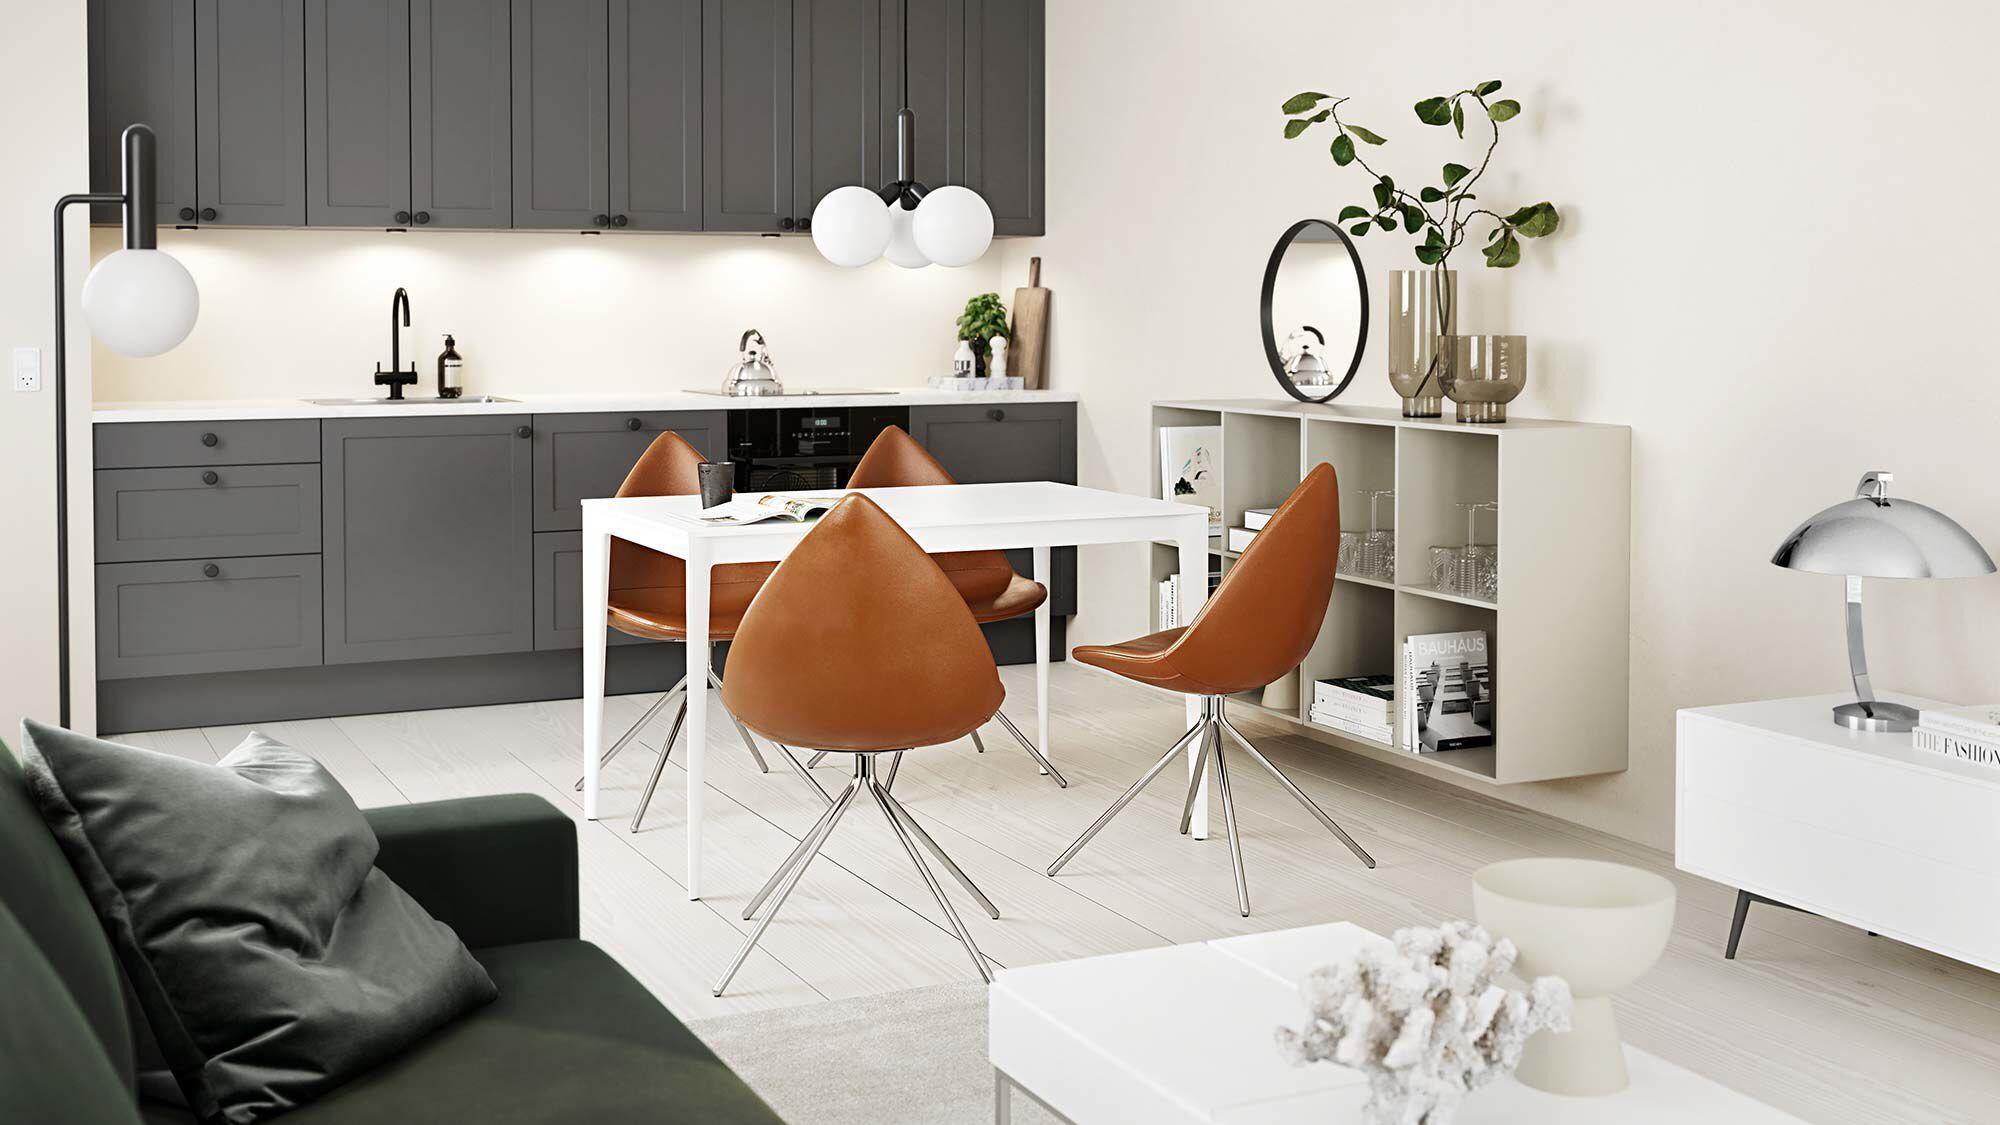 Dining chairs - Ottawa chair